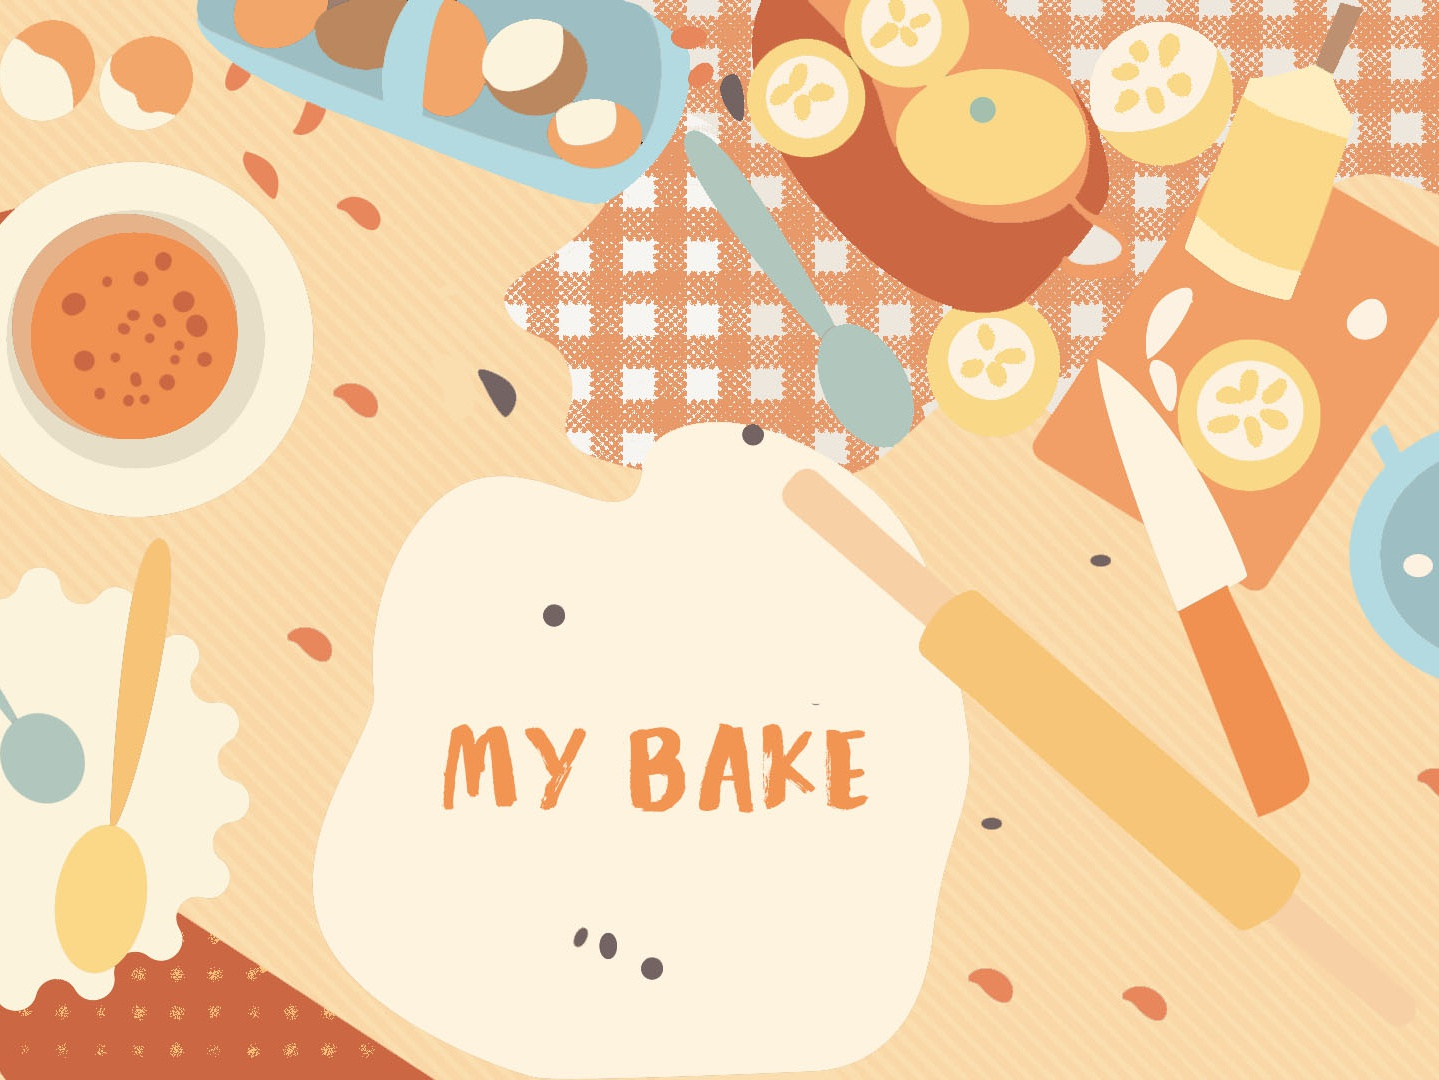 My bake 插图